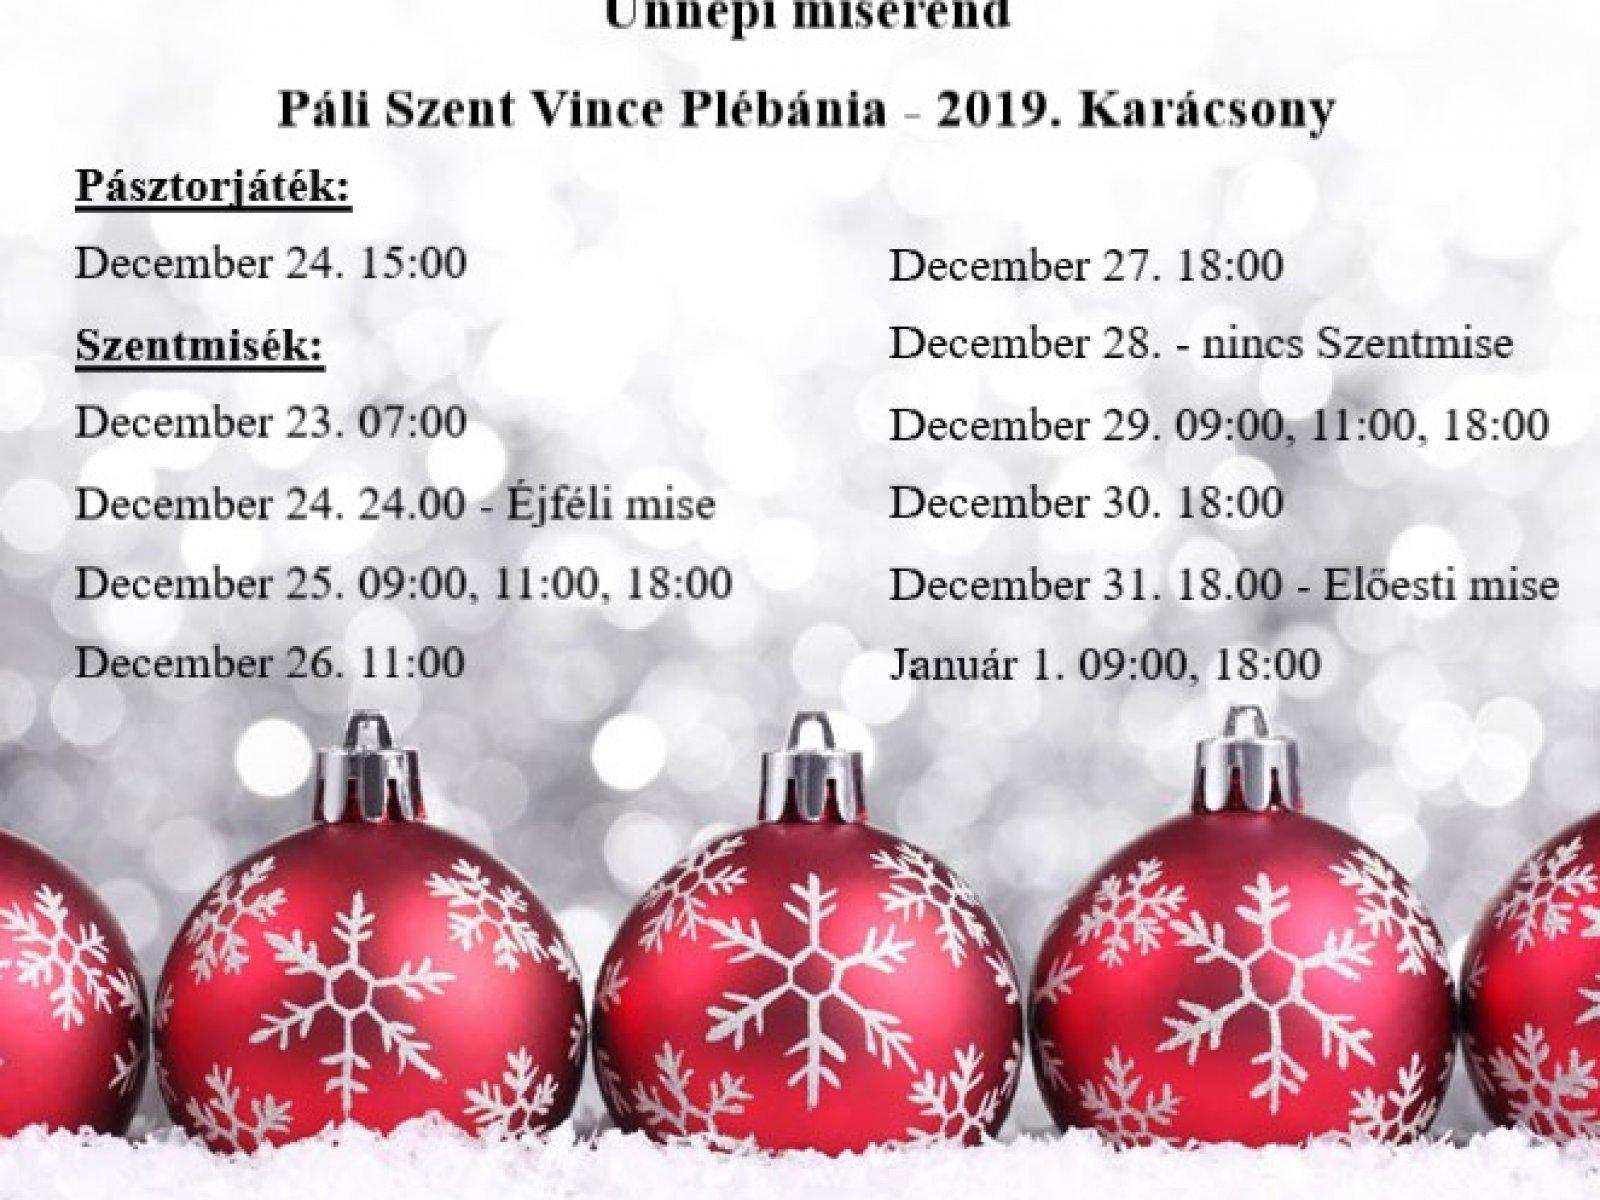 Karácsonyi ünnepi miserend 2019